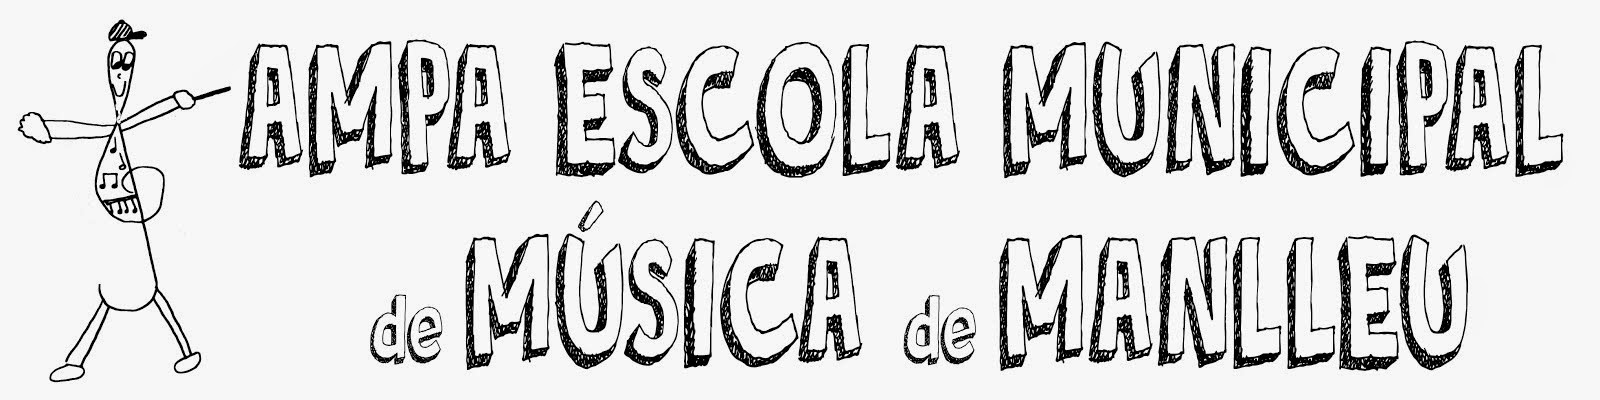 ESCOLA MUNICIPAL DE MÚSICA DE MANLLEU